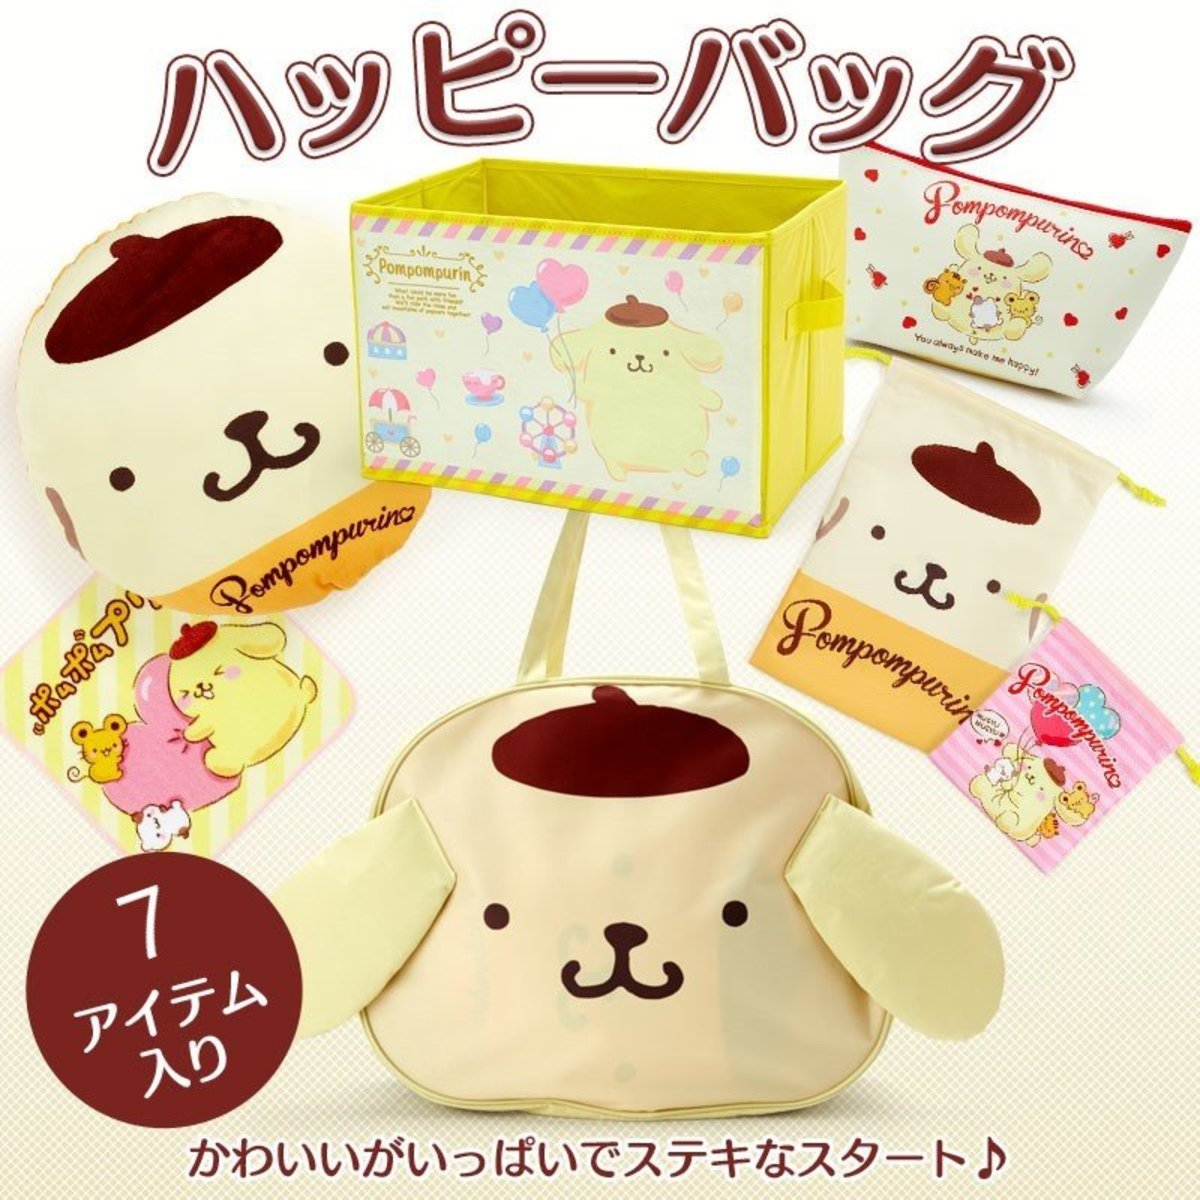 (Pompompurin) Japan Sanrio 2020 Lucky Bag (7 Items)